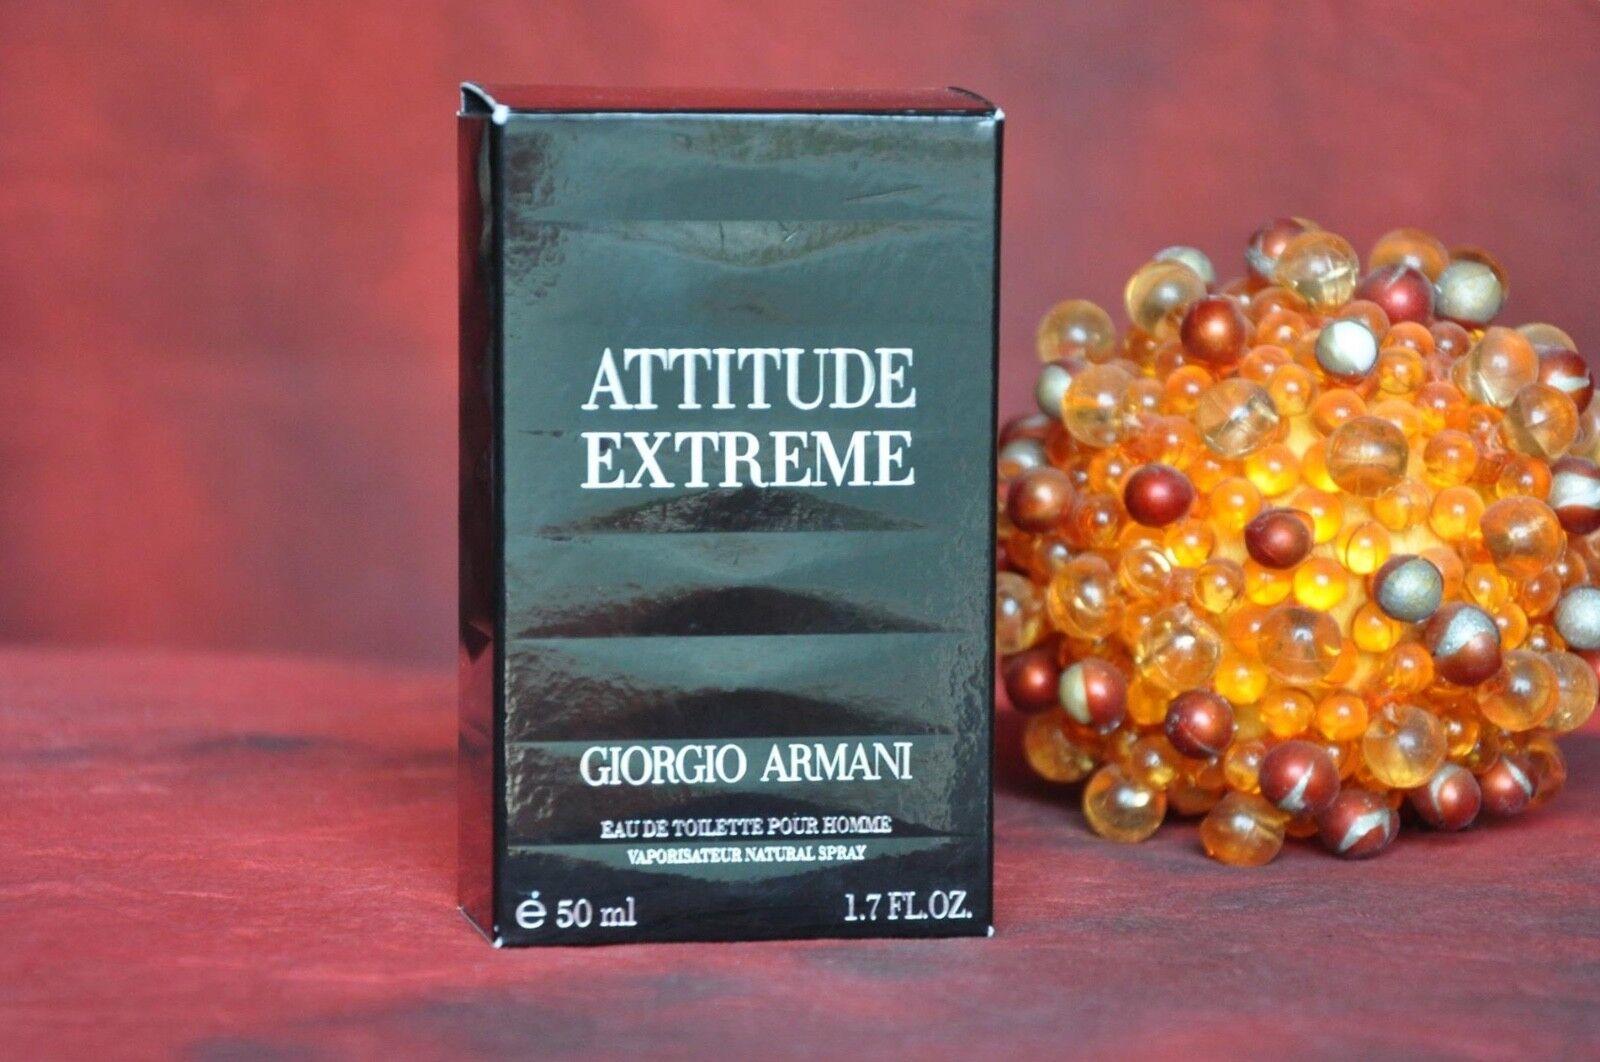 Giorgio Armani Attitude Extreme 17oz Mens Eau De Toilette For Sale